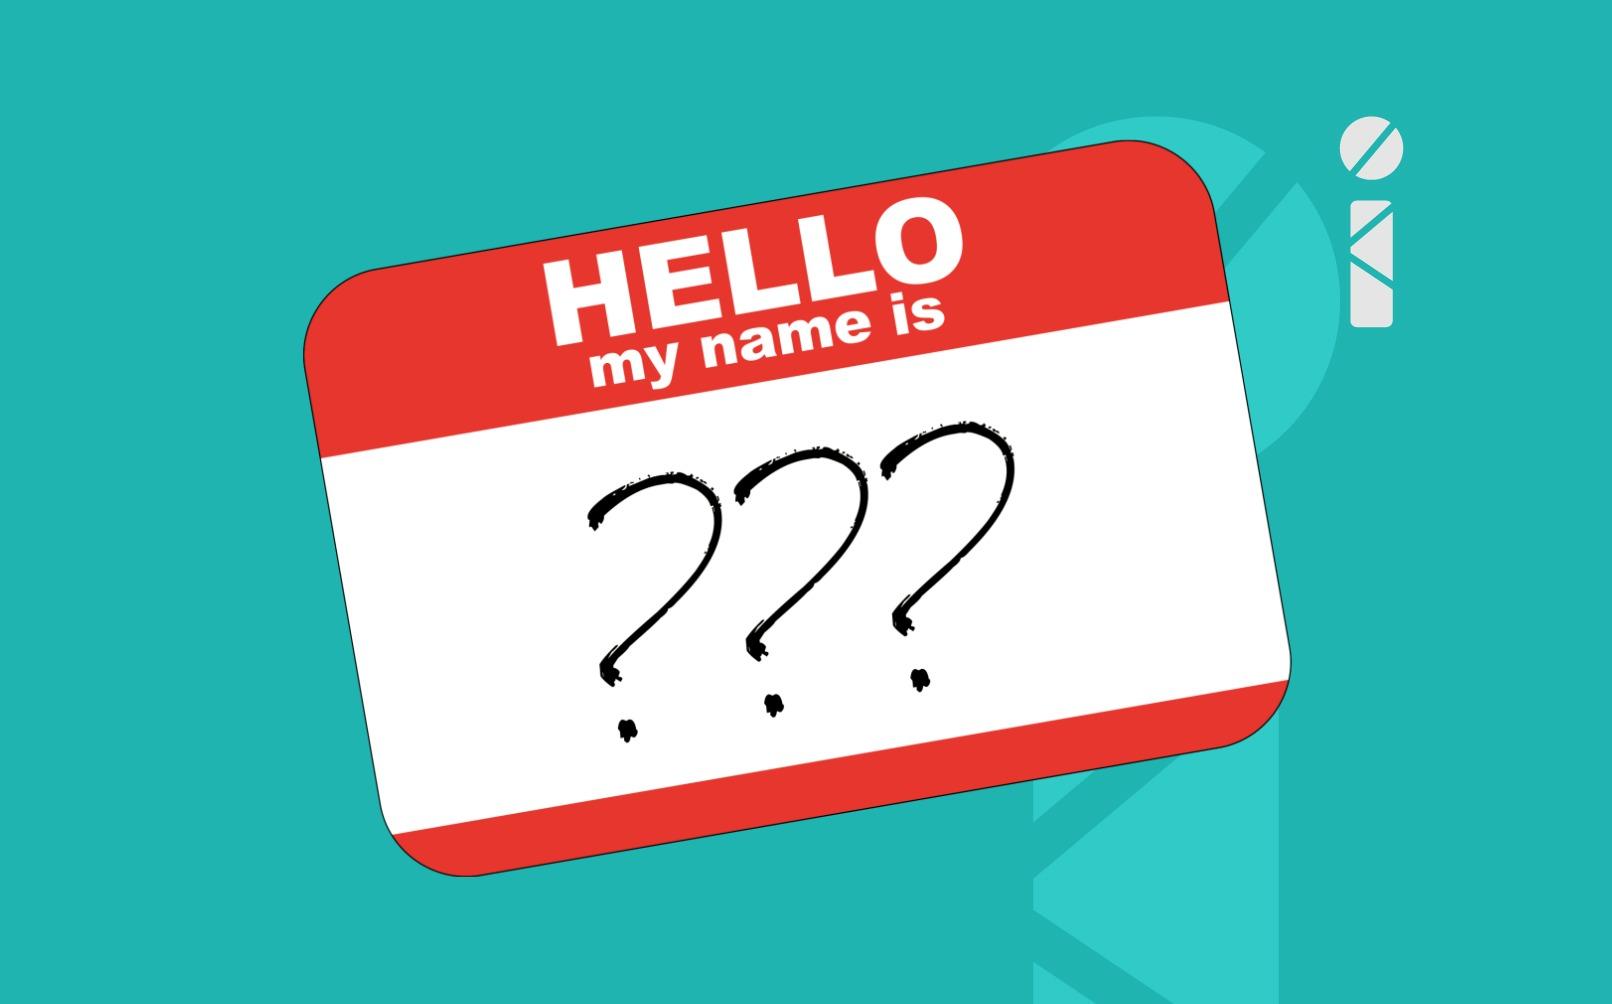 98ab2a0f7a5 Cómo elegir un nombre para mi canal de YouTube  - YouTuber Today